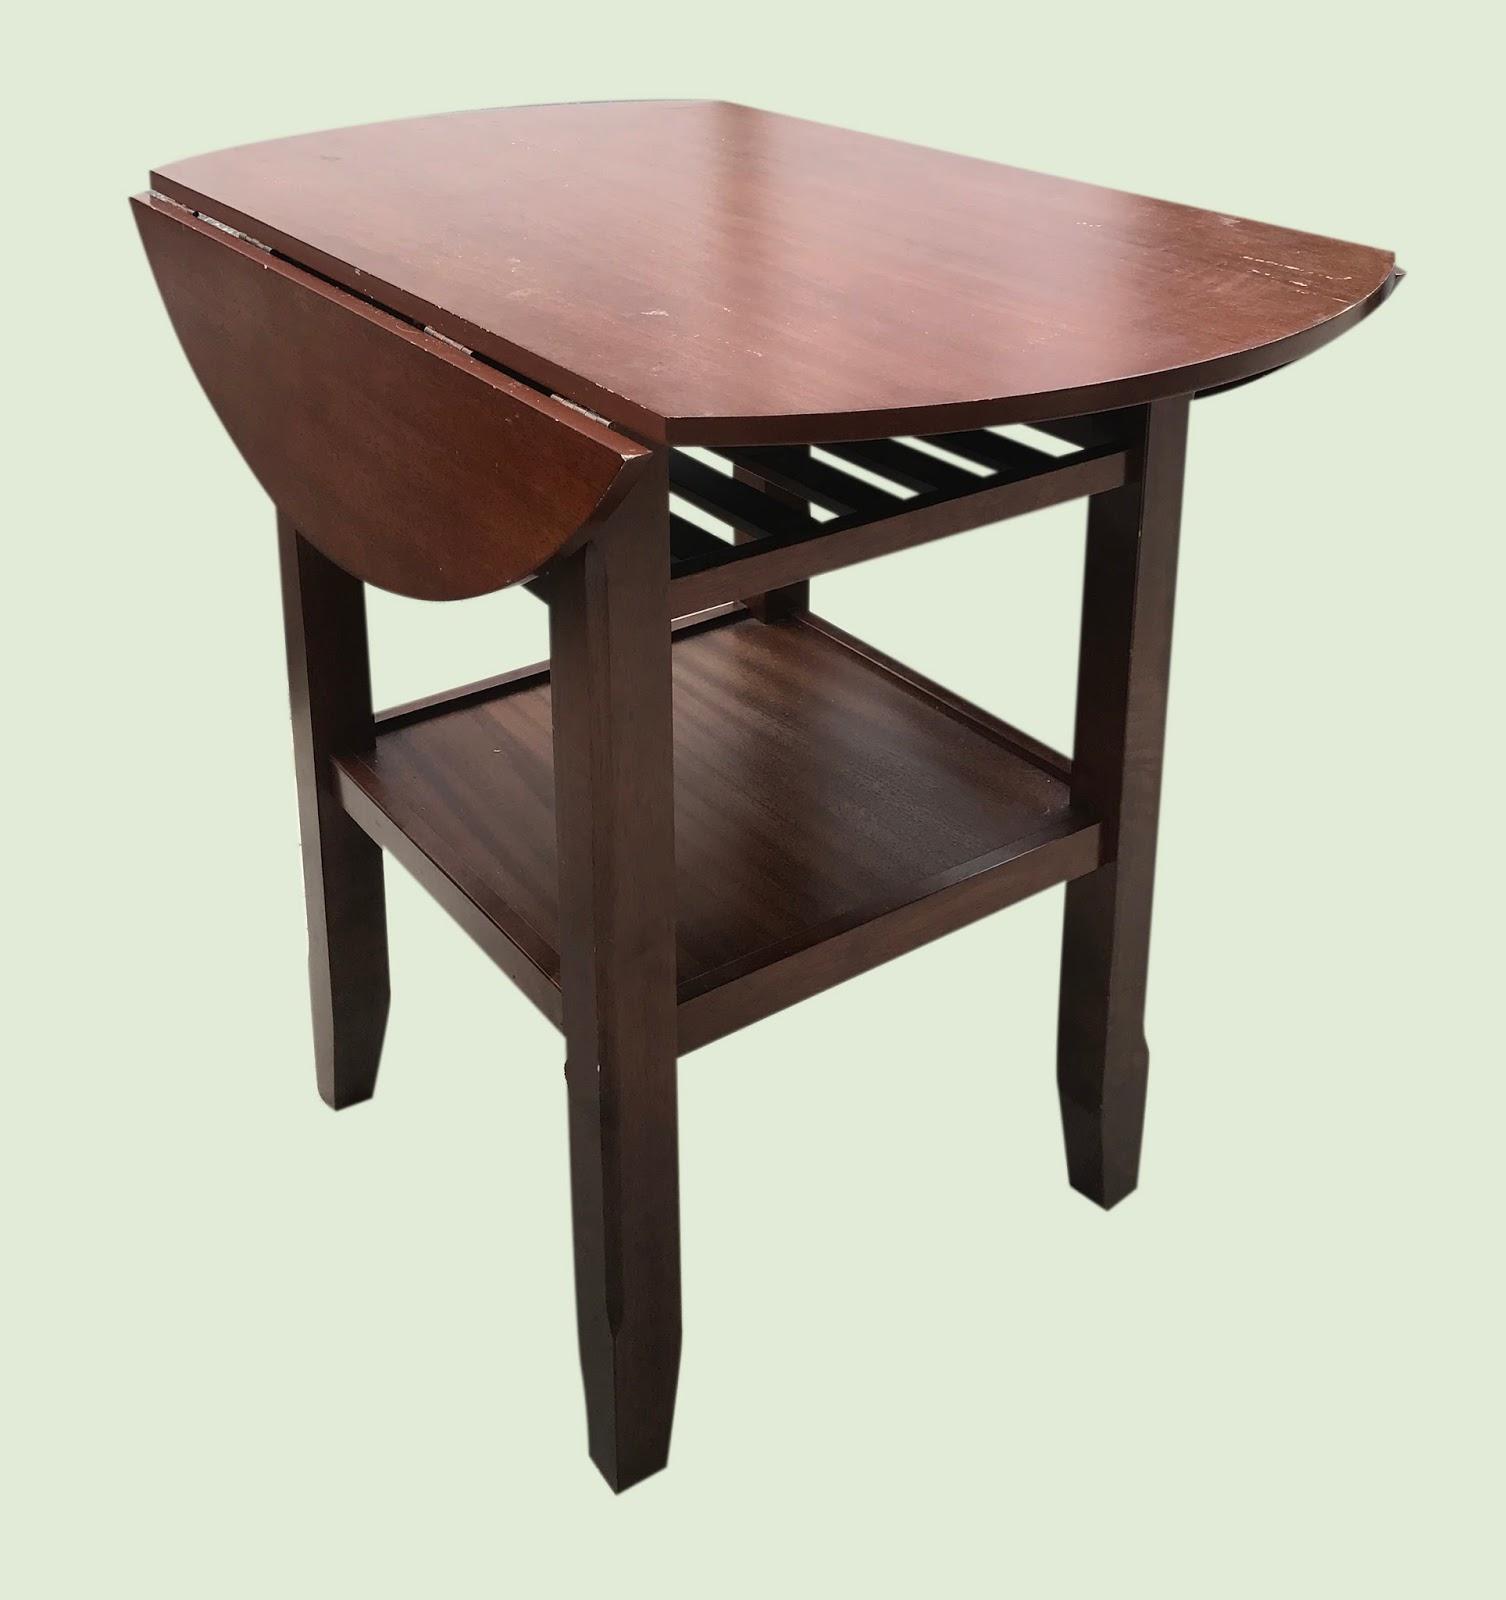 Free Pick Up Donations Furniture Uhuru Furniture & Collectibles: Drop-Leaf Pub Table - $125 ...